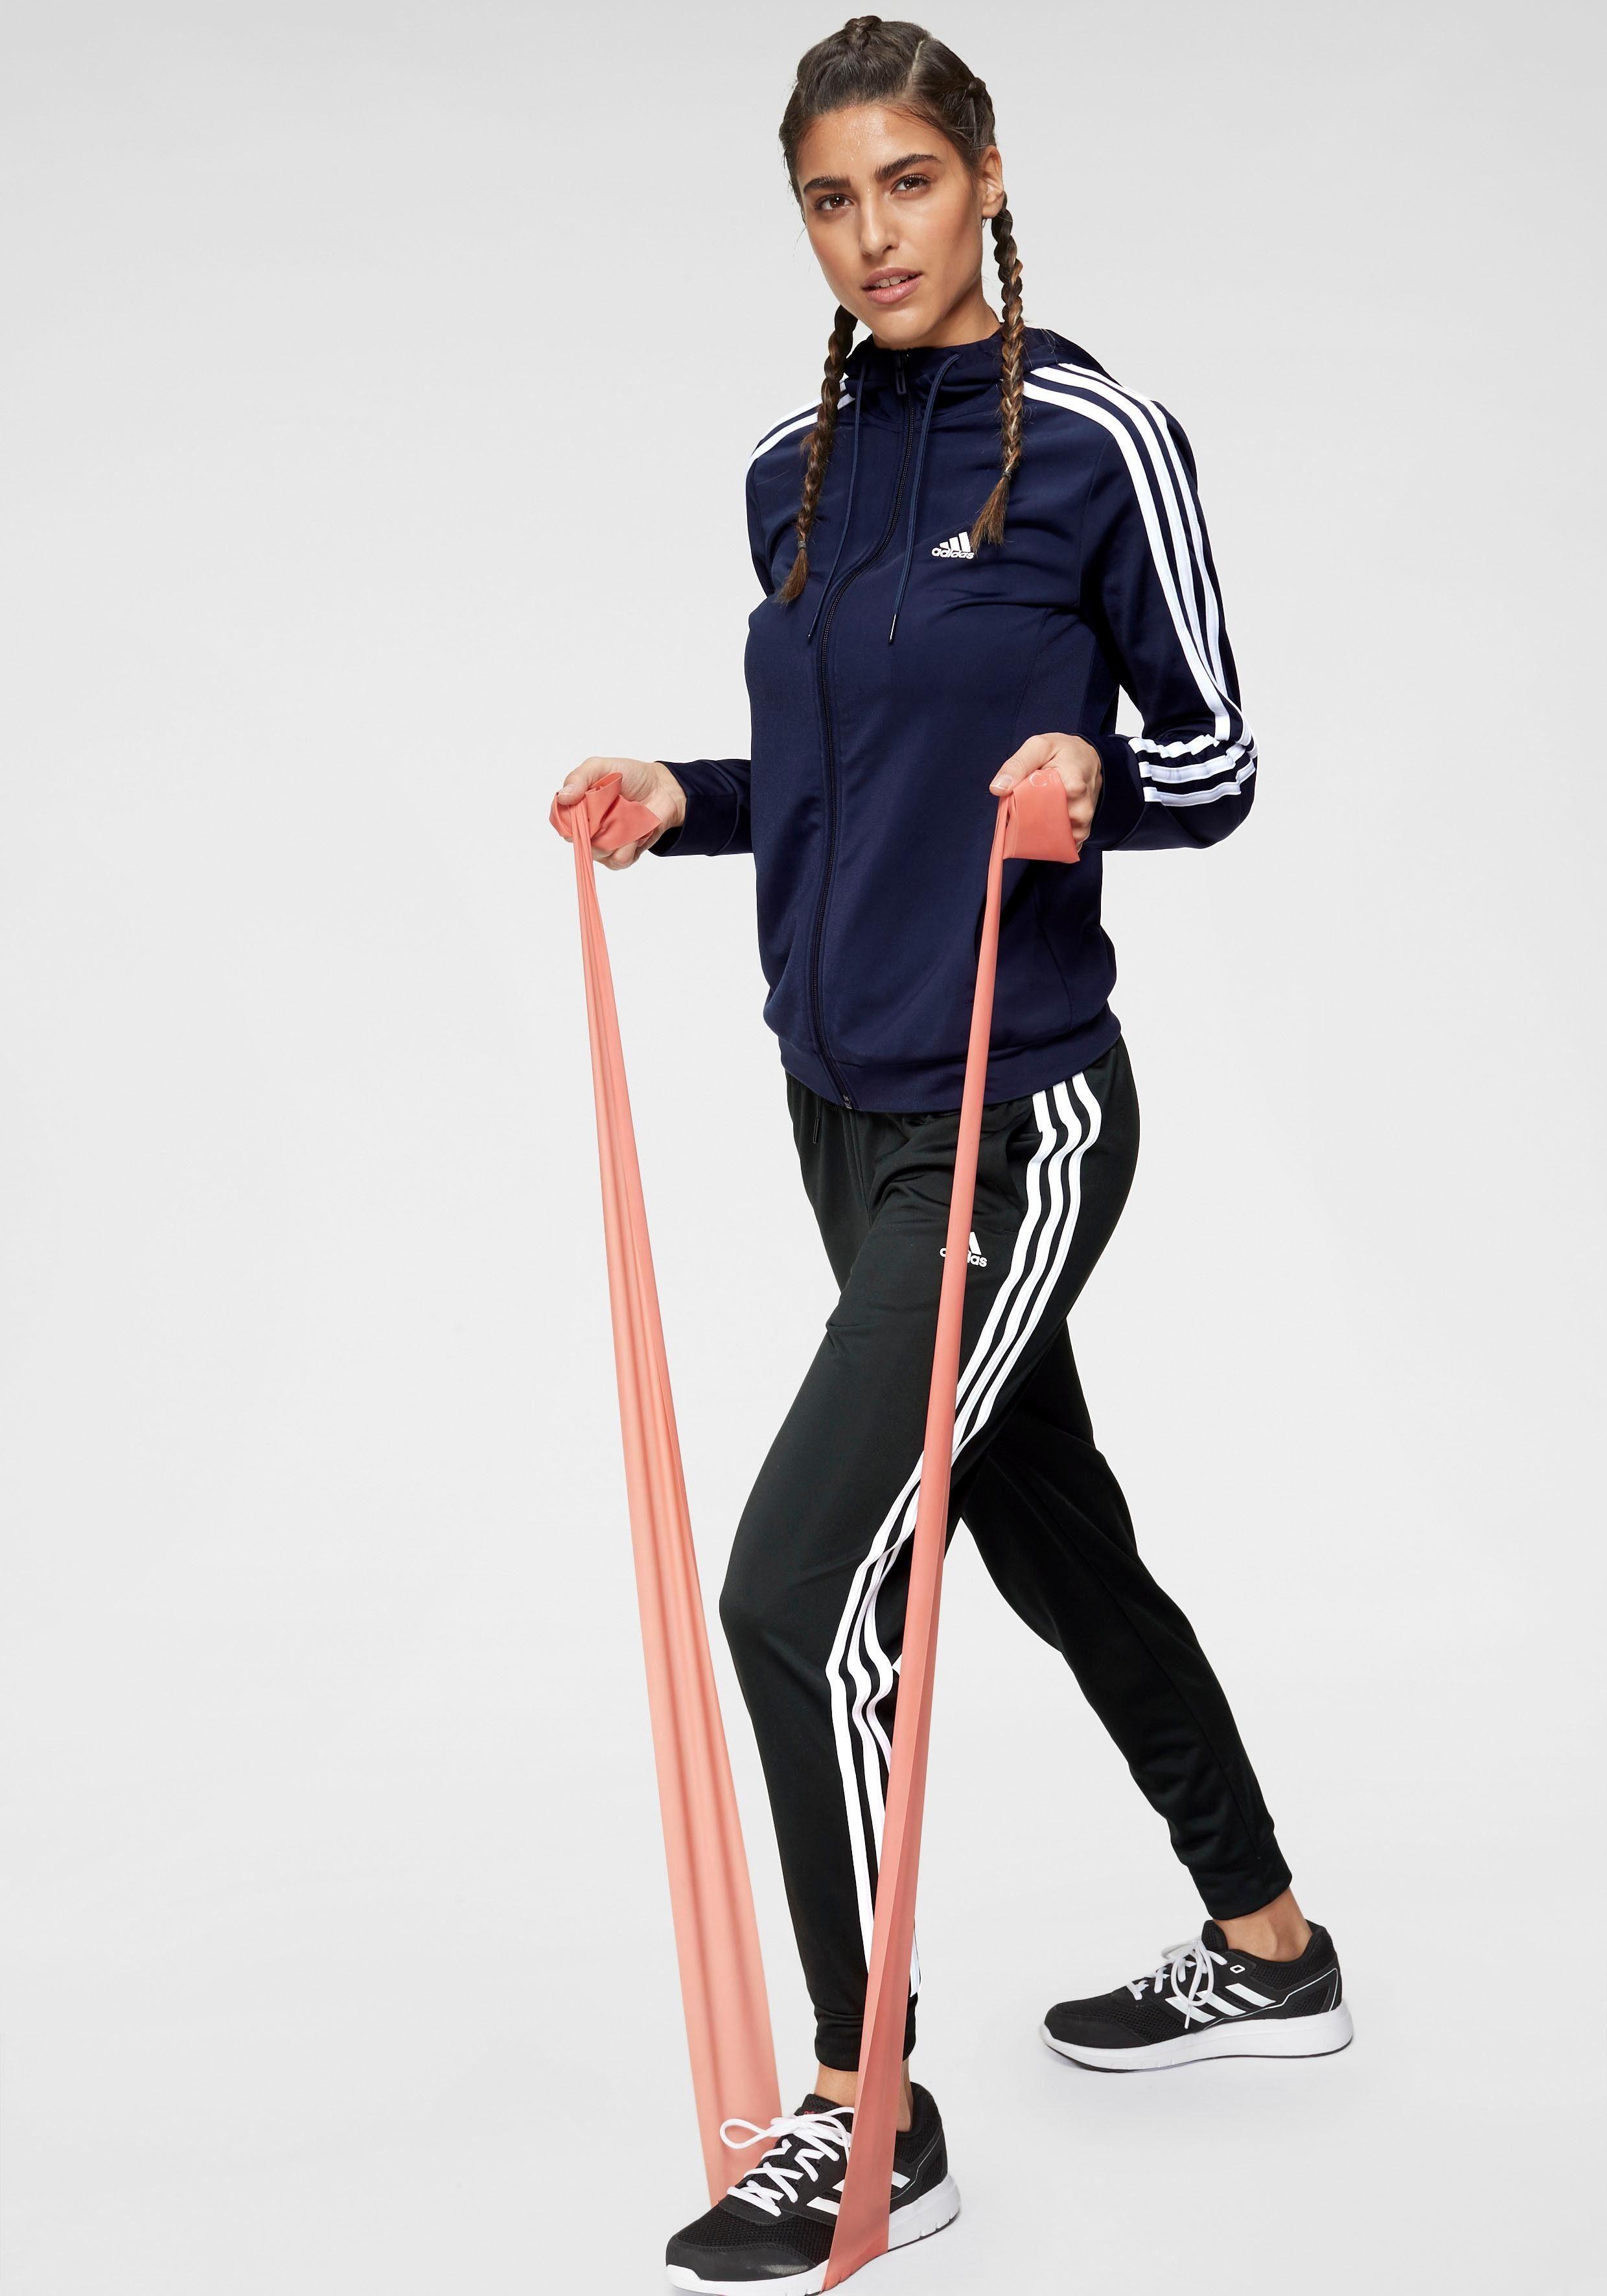 OTTO Damen adidas Performance Trainingsanzug »OSR POLYESTER 3 STRIPES TRACKSUIT« (Set, 2 tlg) blau, rosa | 04062052223819